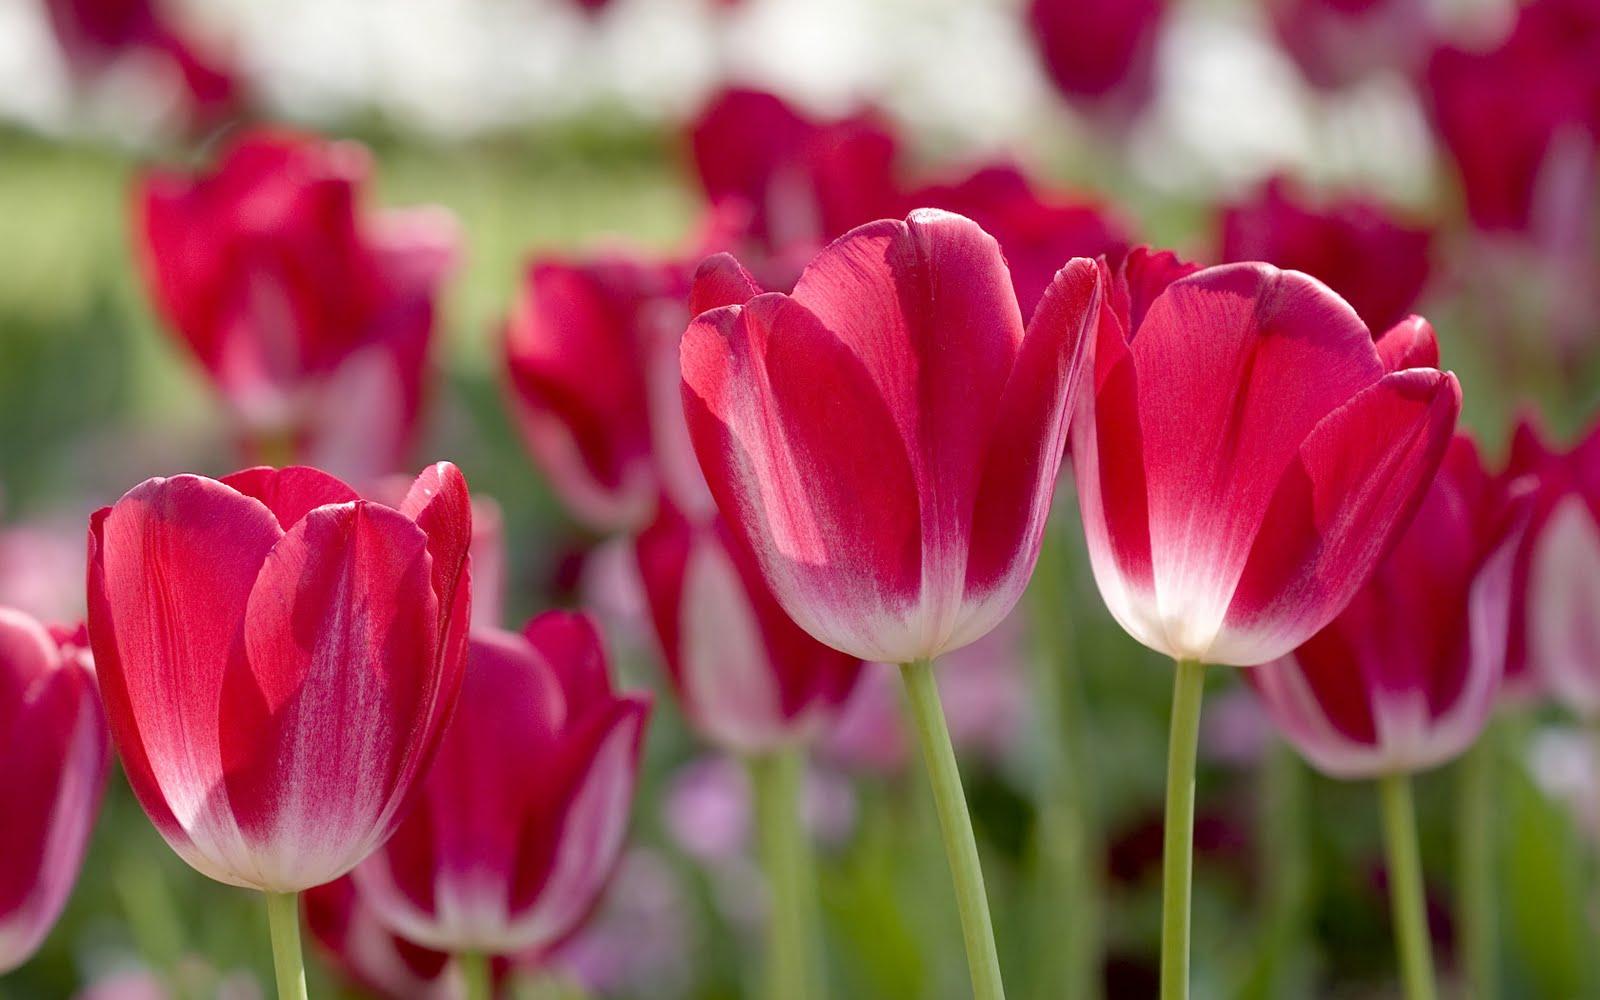 http://4.bp.blogspot.com/-JWwF76_bg7o/Tf-YCA3K_PI/AAAAAAAADro/B9gxyKLtmWQ/s1600/spring-flowers-wallpaper-2.jpg